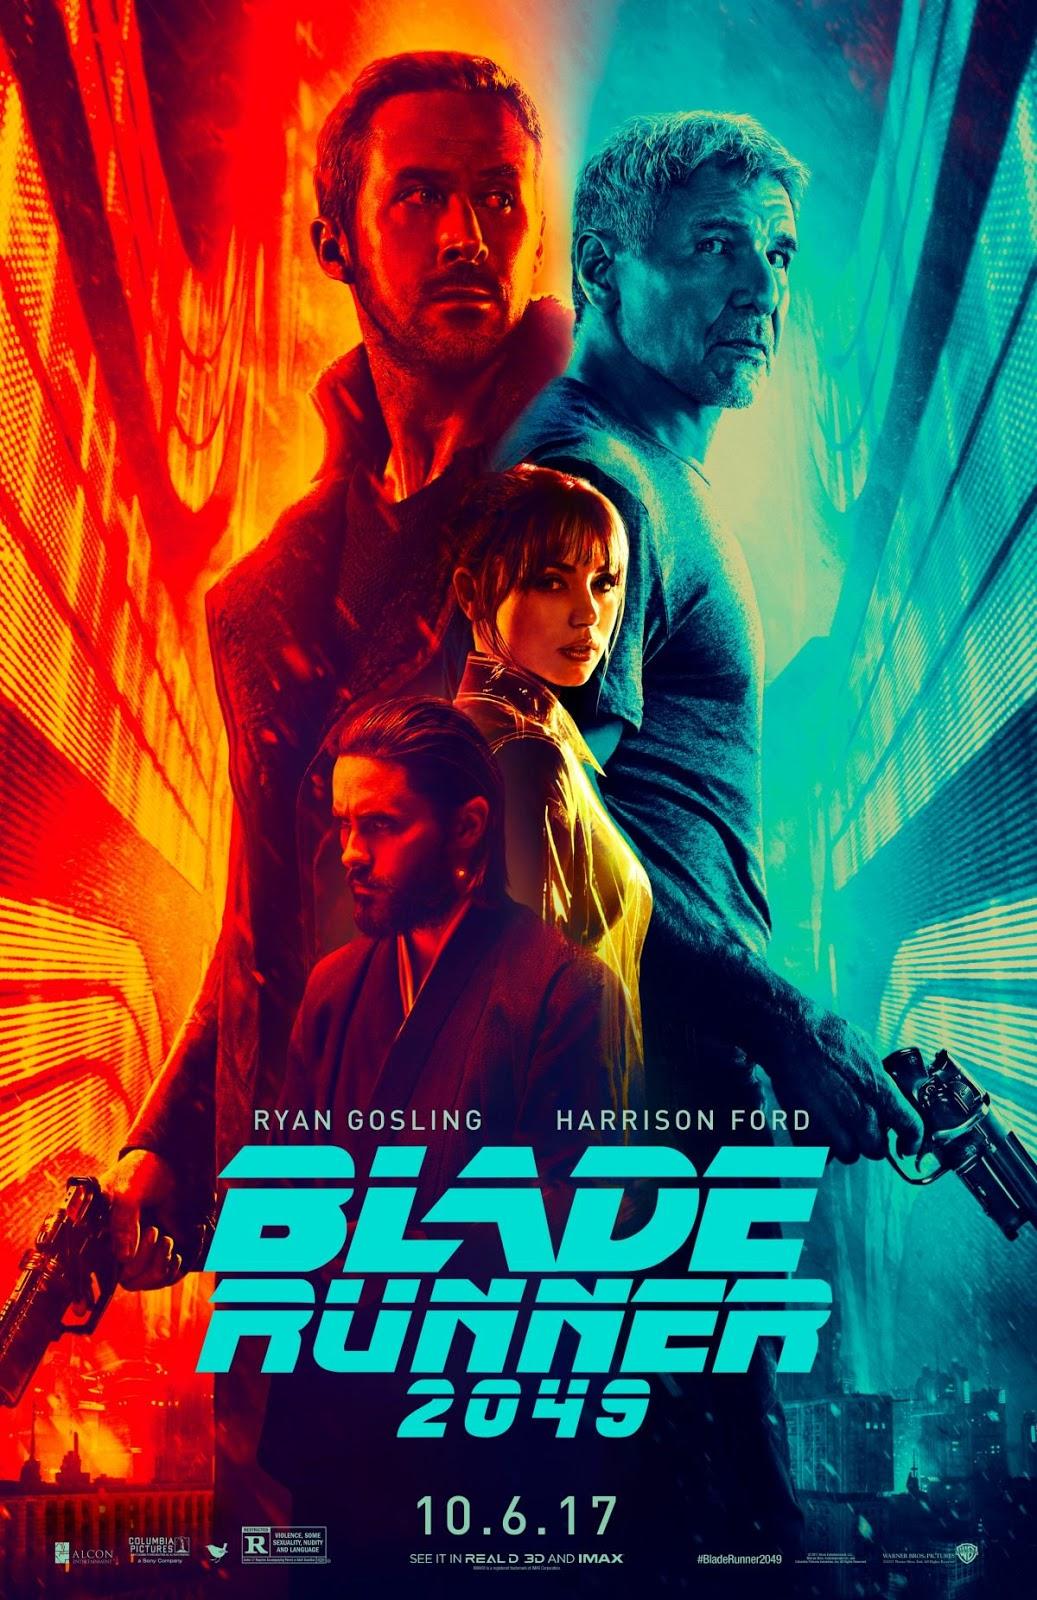 Capa Blade Runner 2049 Torrent Dublado 720p 1080p 5.1 Baixar